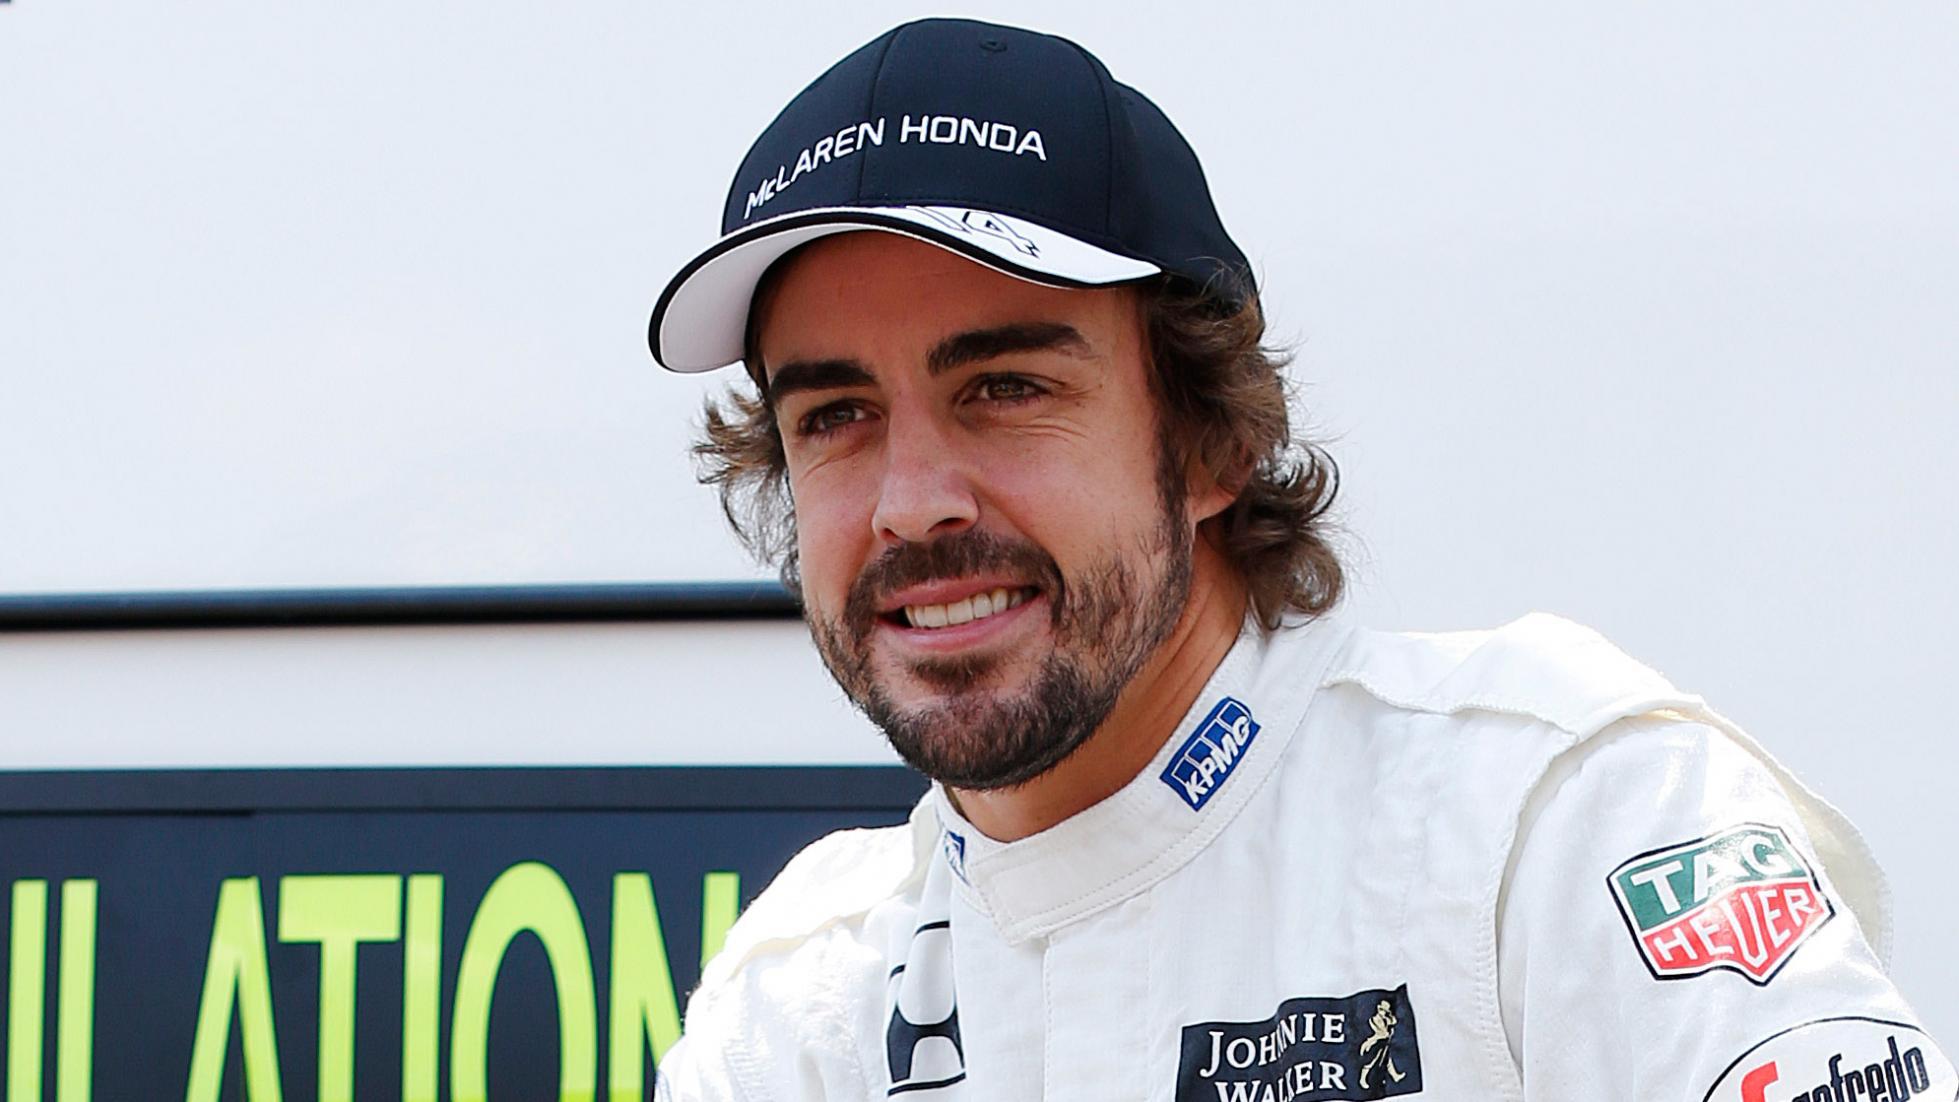 van dong vien - elle man - Fernando Alonso